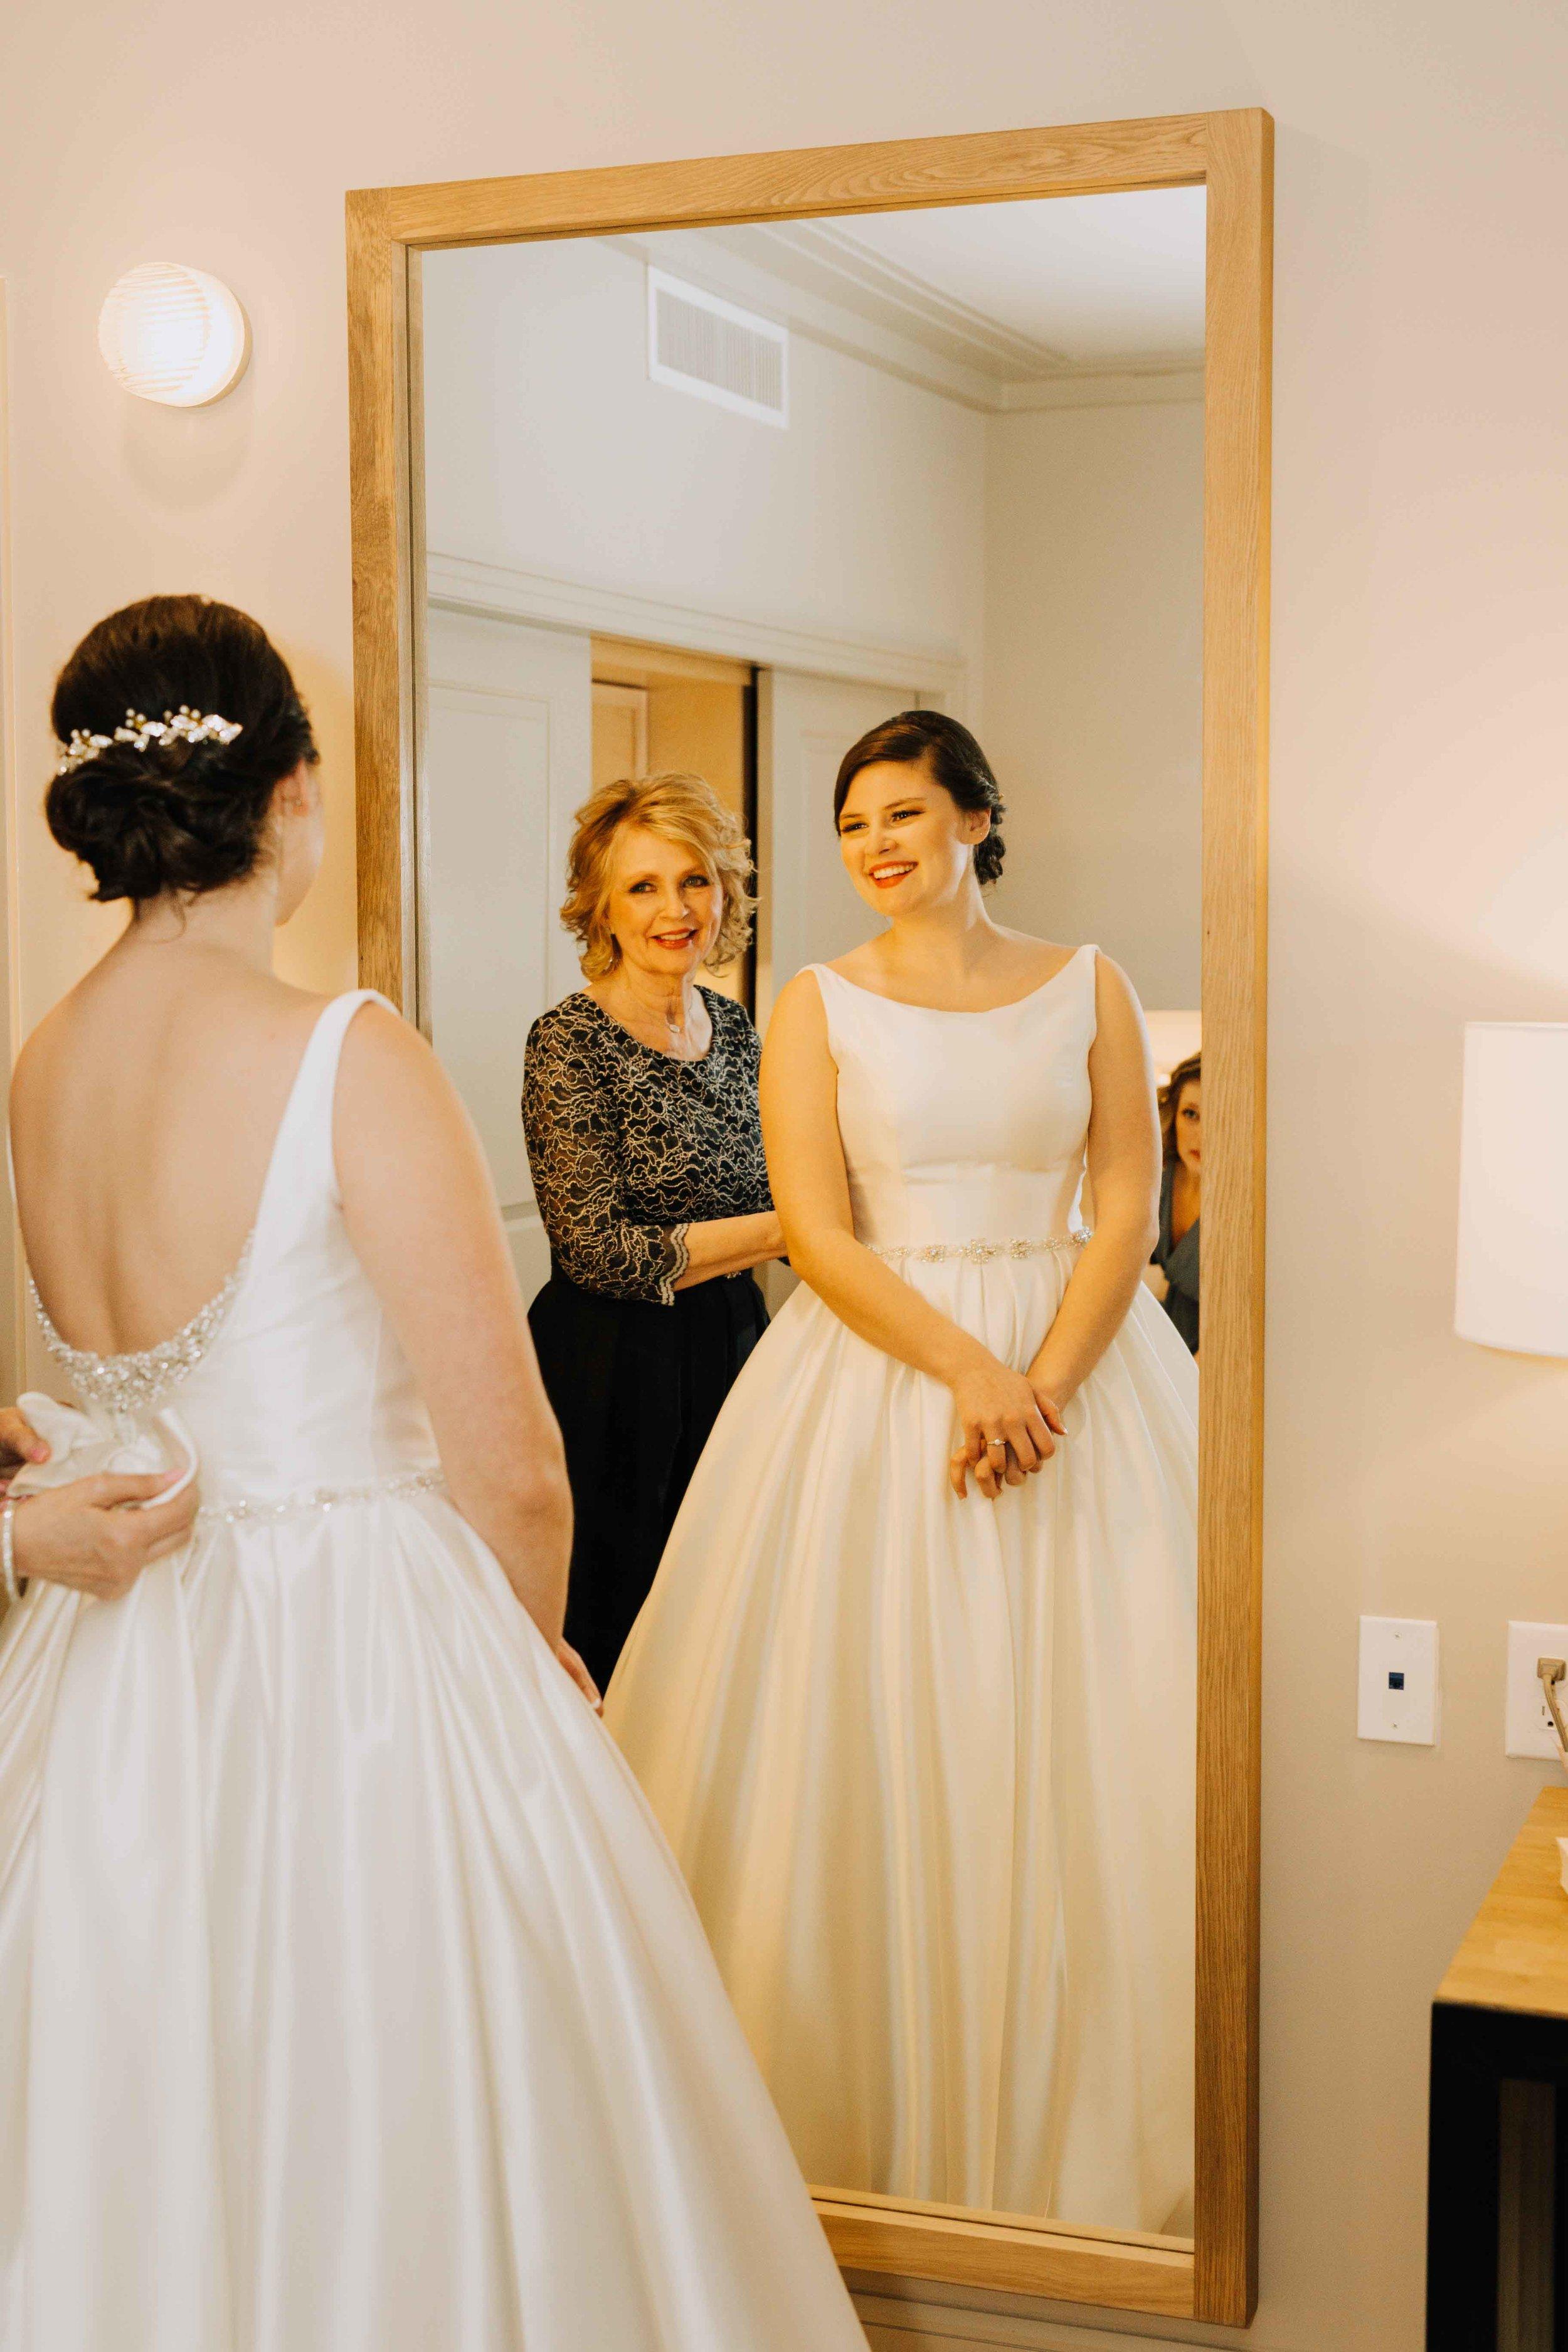 Farmville-Virginia-Wedding-Hotel-Weynoke-Downtown-Jacqueline-Waters-Photography-Detailed- (186).jpg